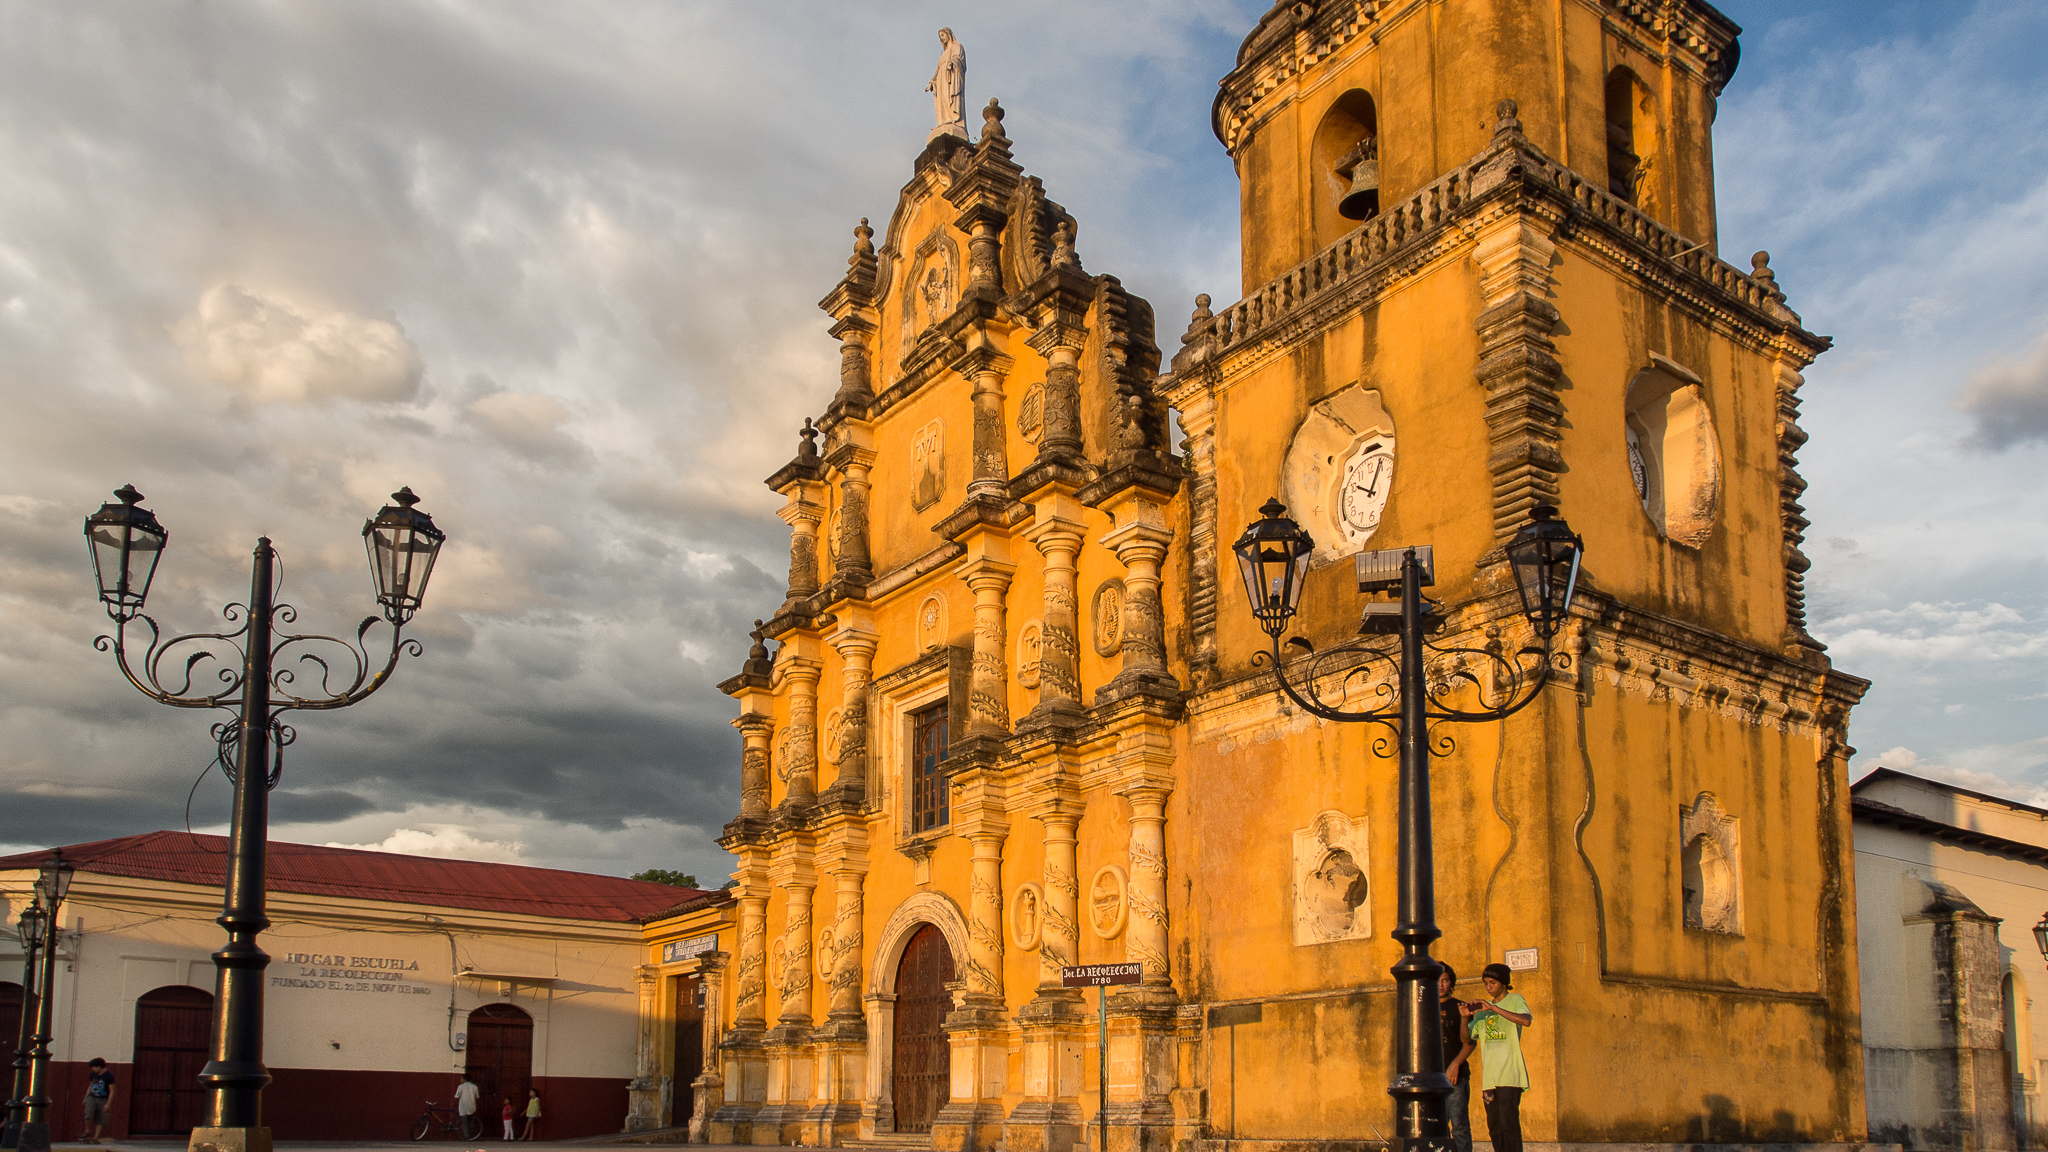 La Recolección church, Nicaragua